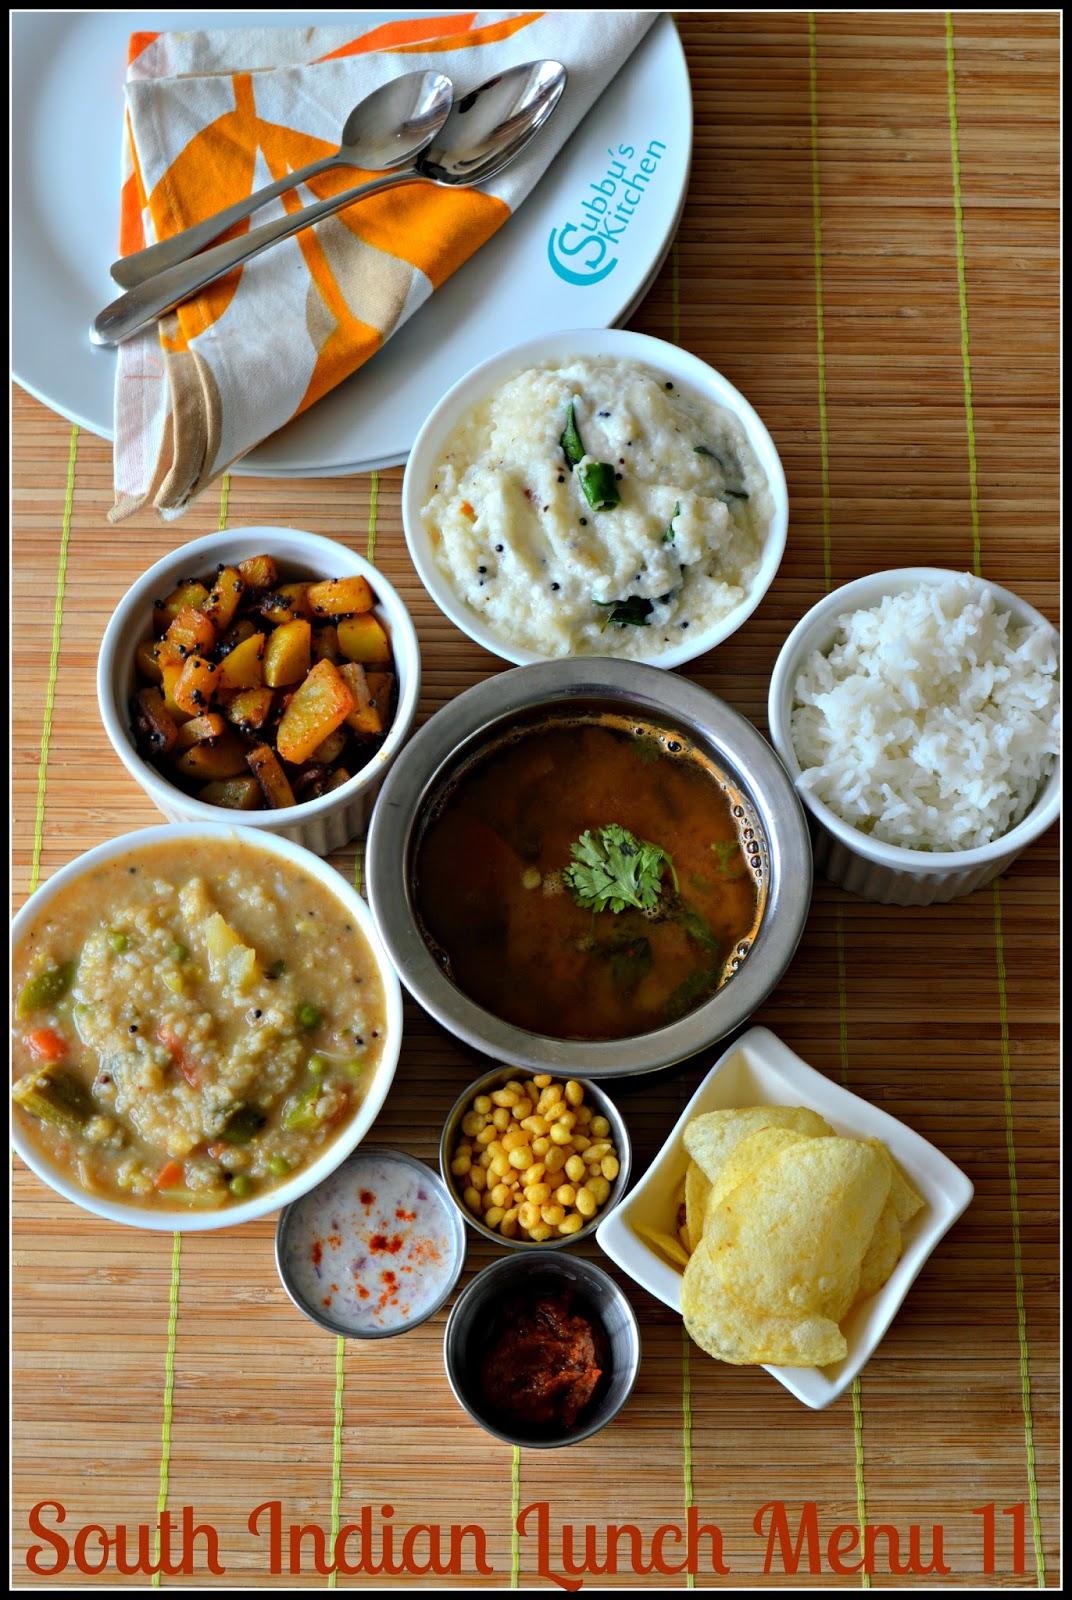 South Indian Lunch Menu 12 - Bisibelabath, Kalyana Rasam, Potato stir-fry and Onion Raitha